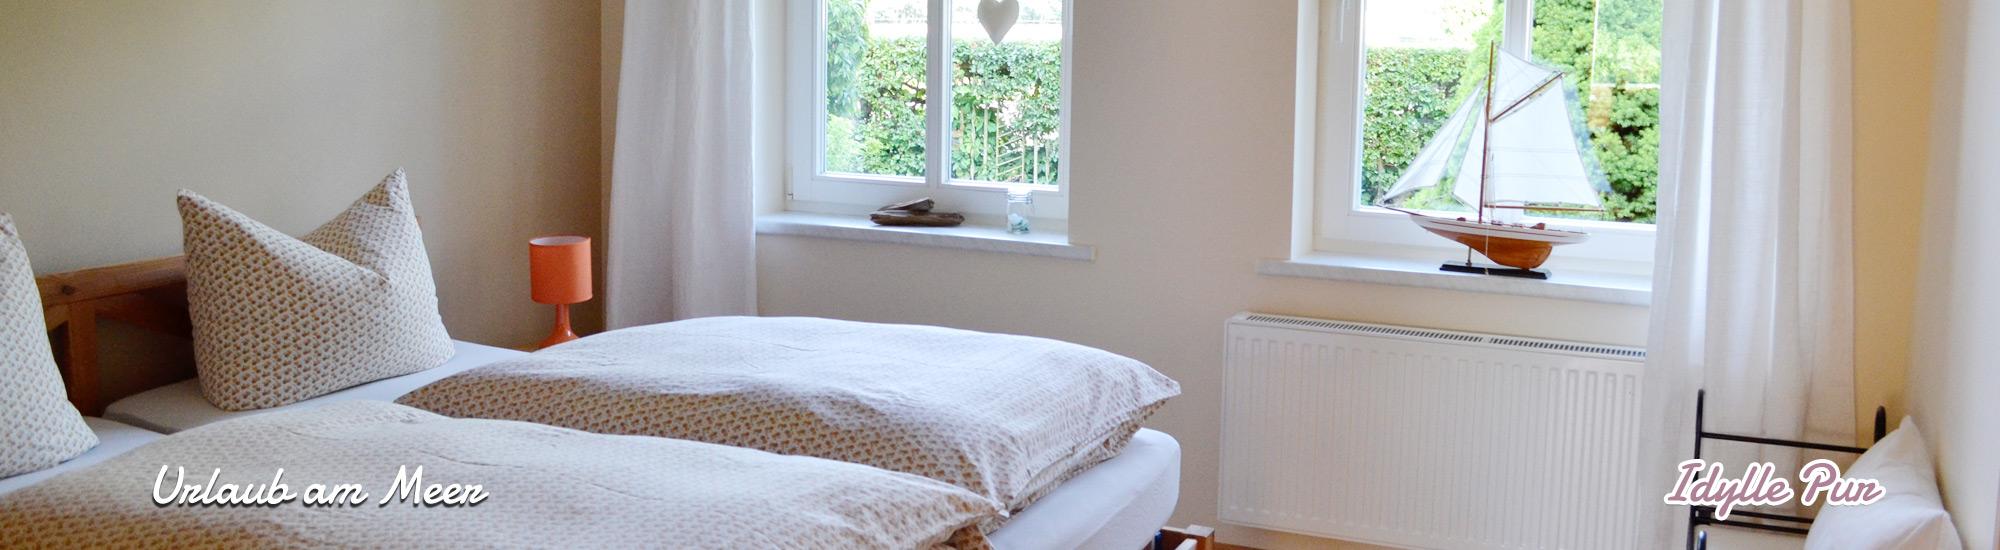 Landhaus-stine-schlafzimmer - Landhaus Stine